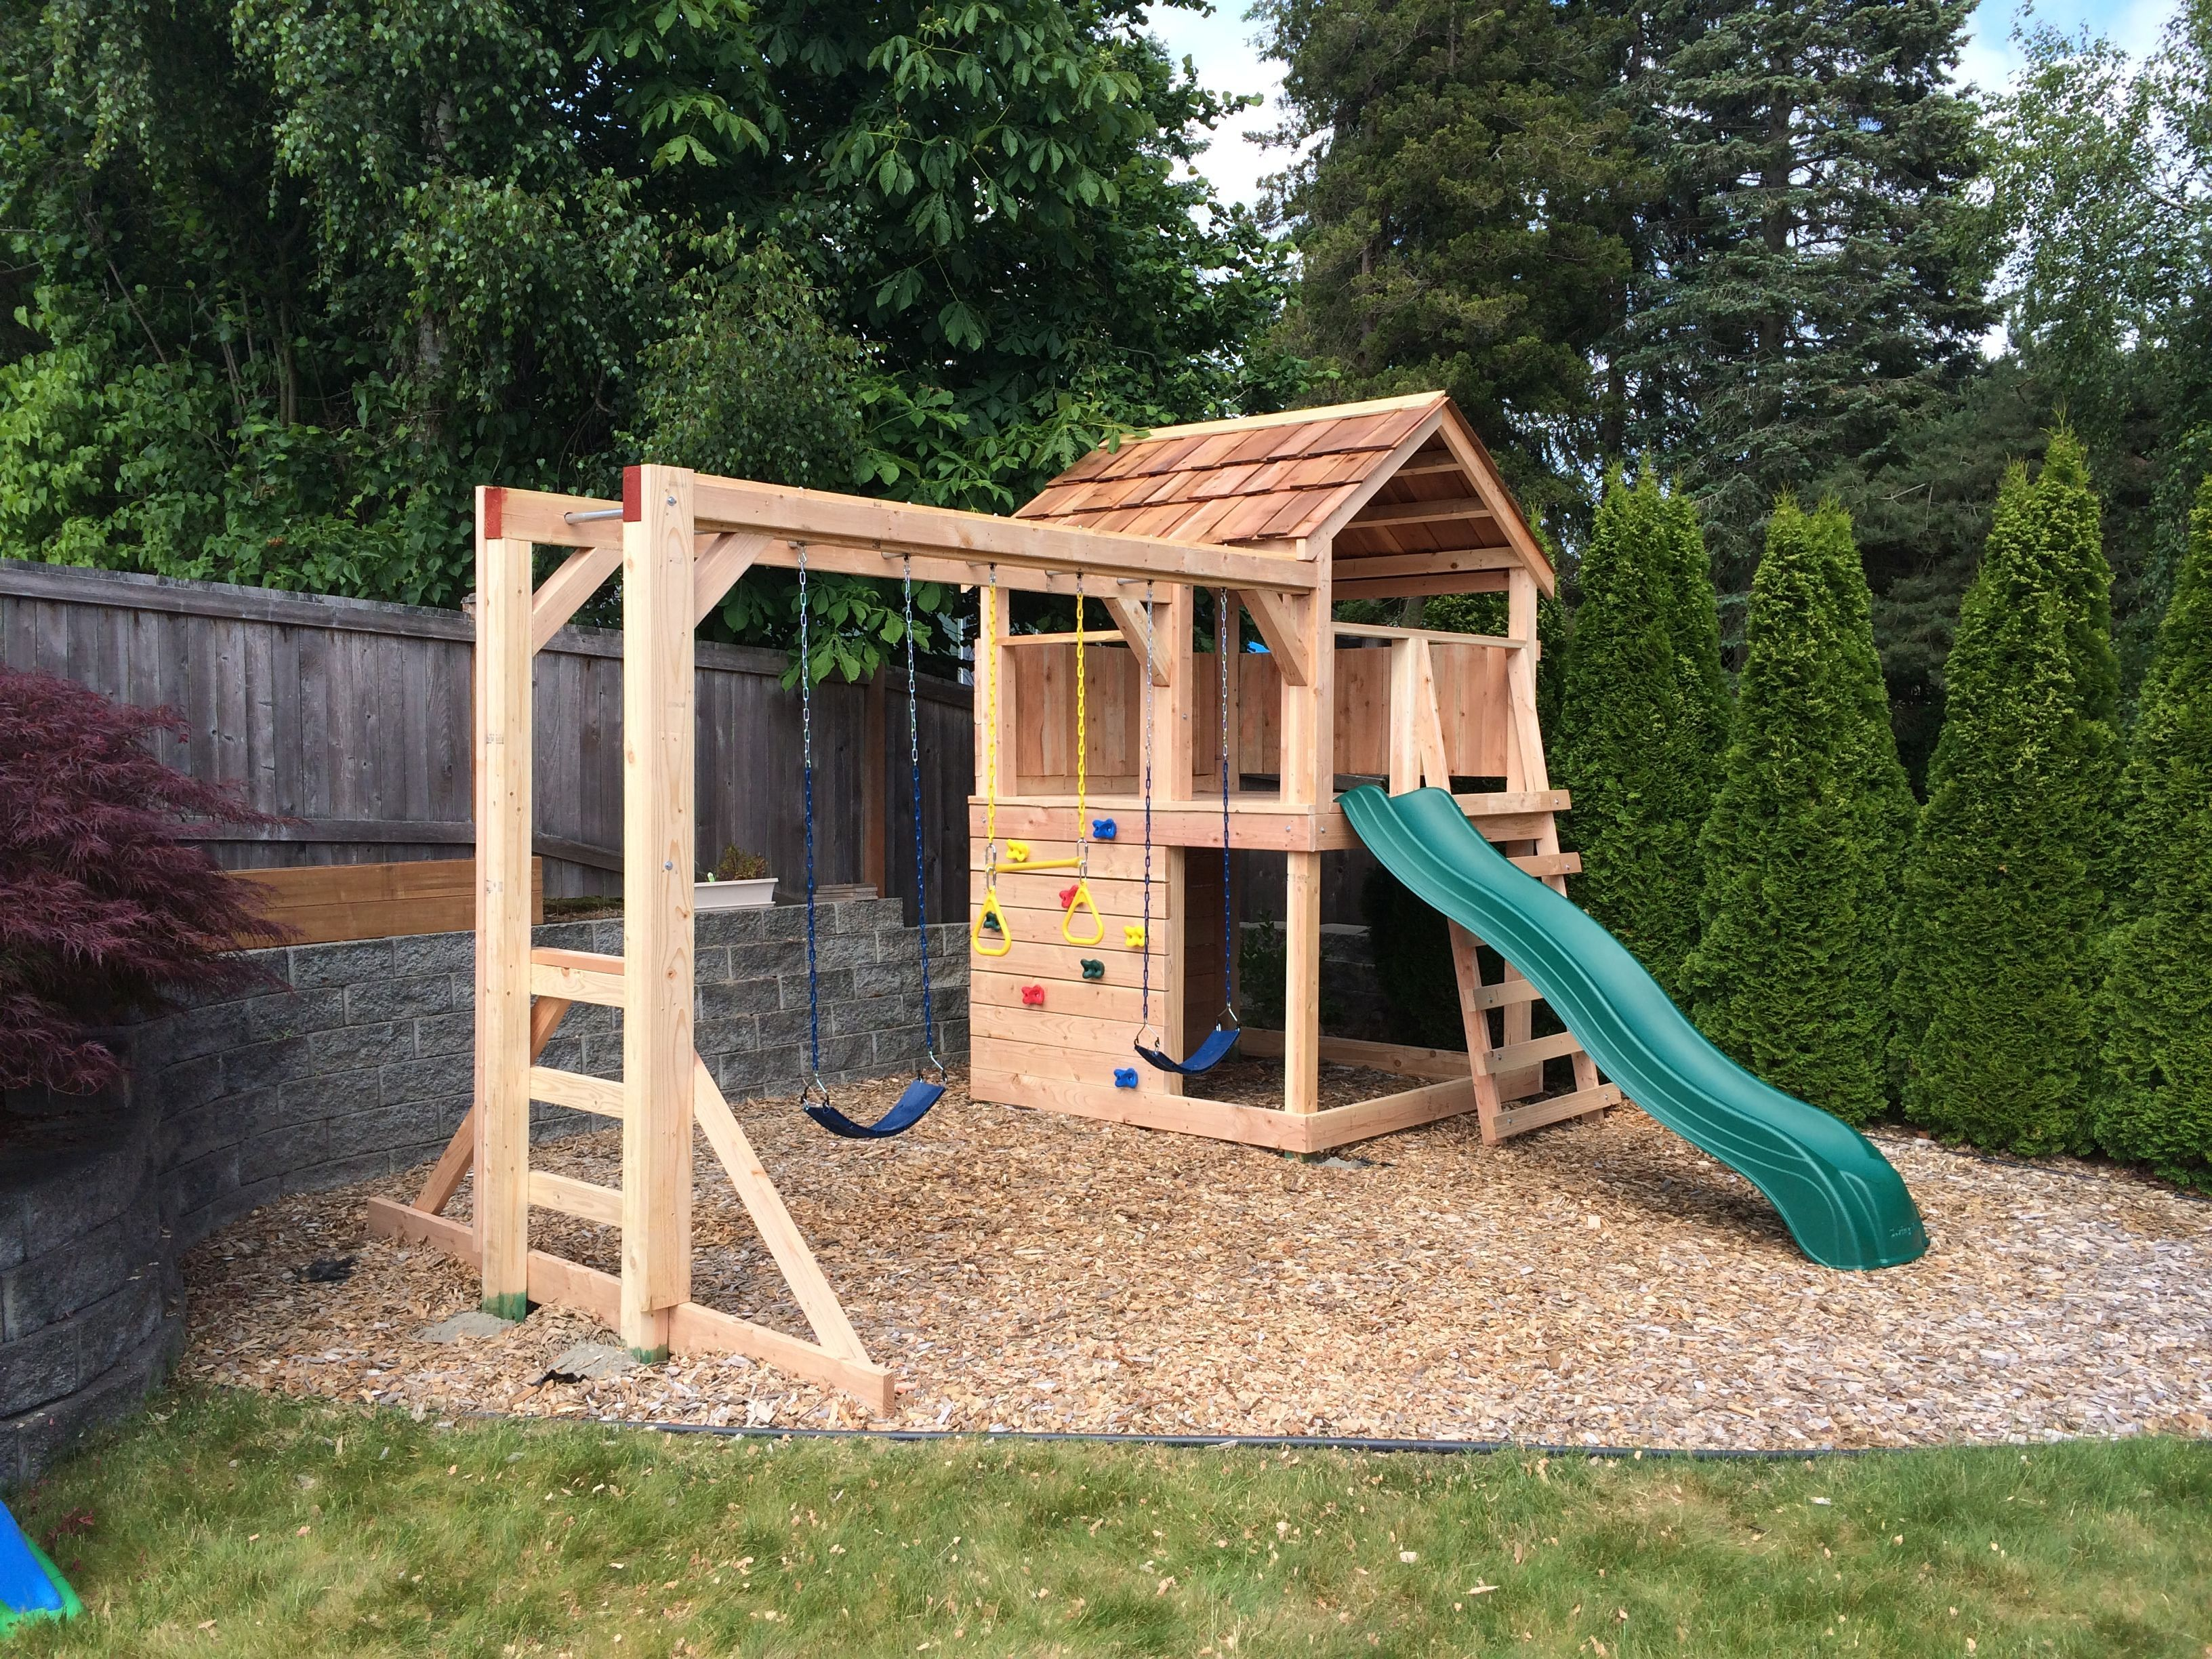 Evergreenplaysets Swing Set Playhouse Custom Built For